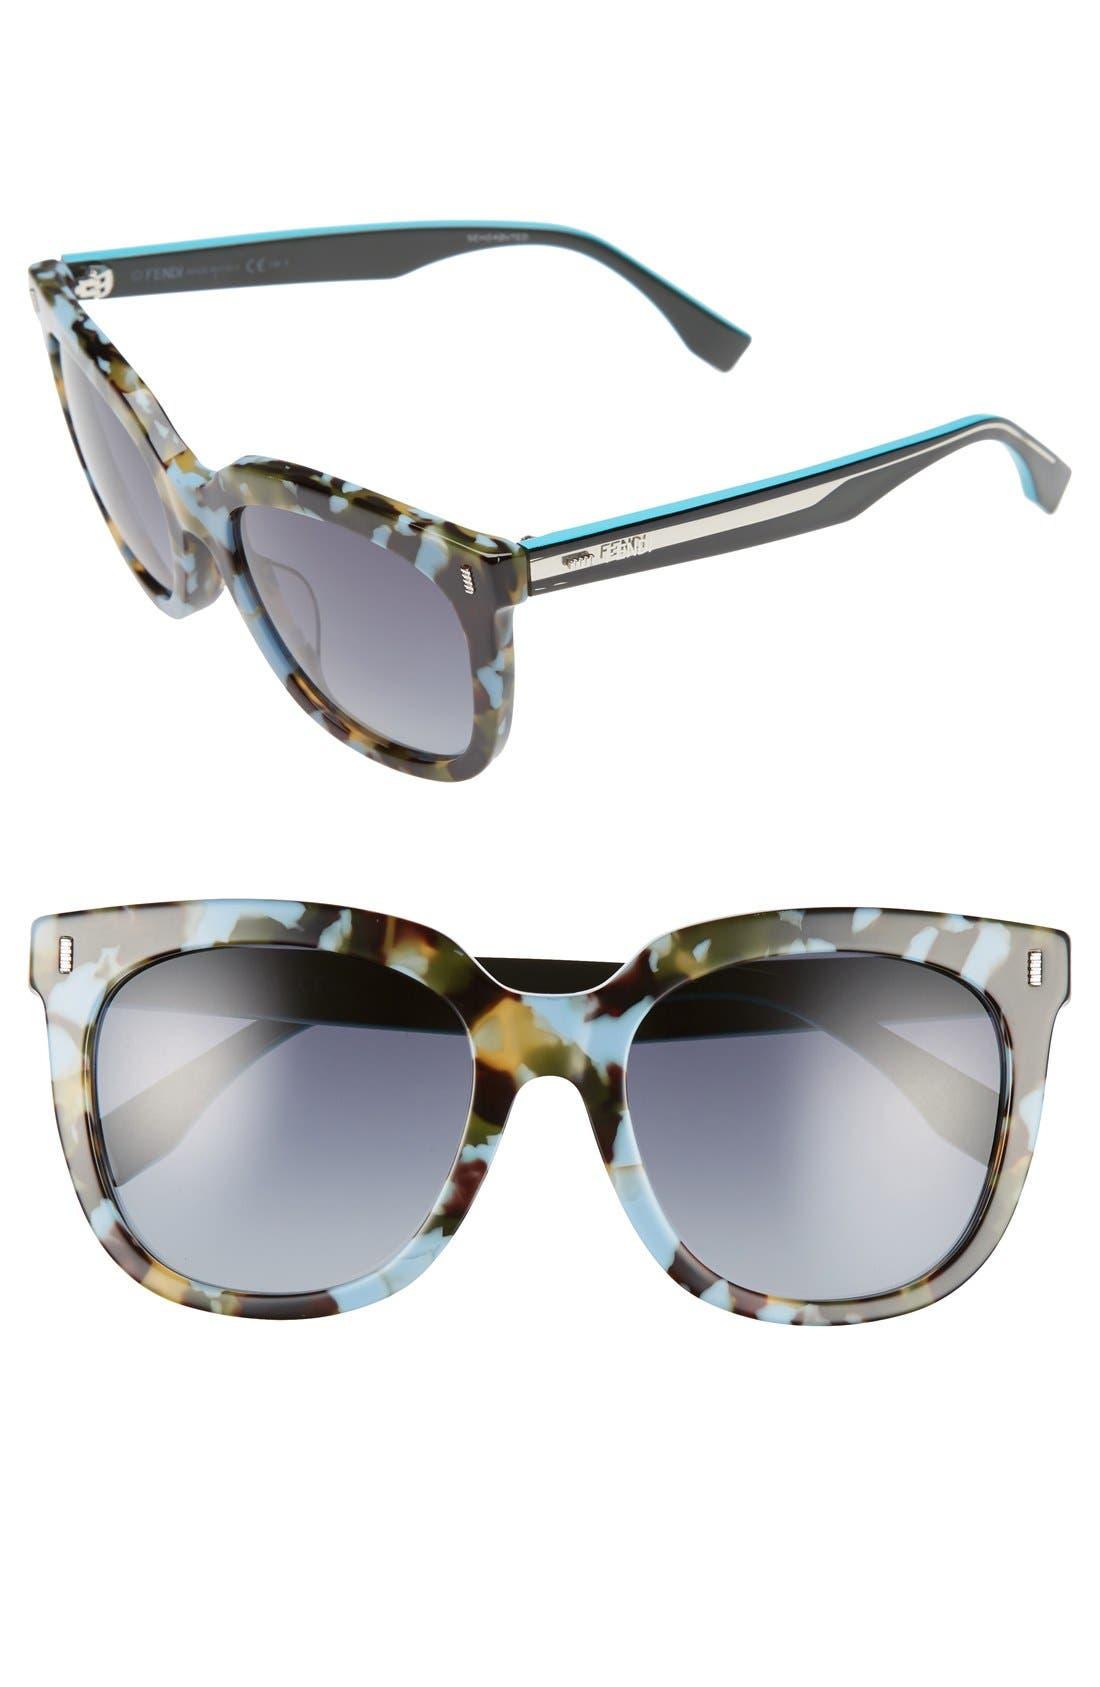 Main Image - Fendi 54mm Retro Sunglasses